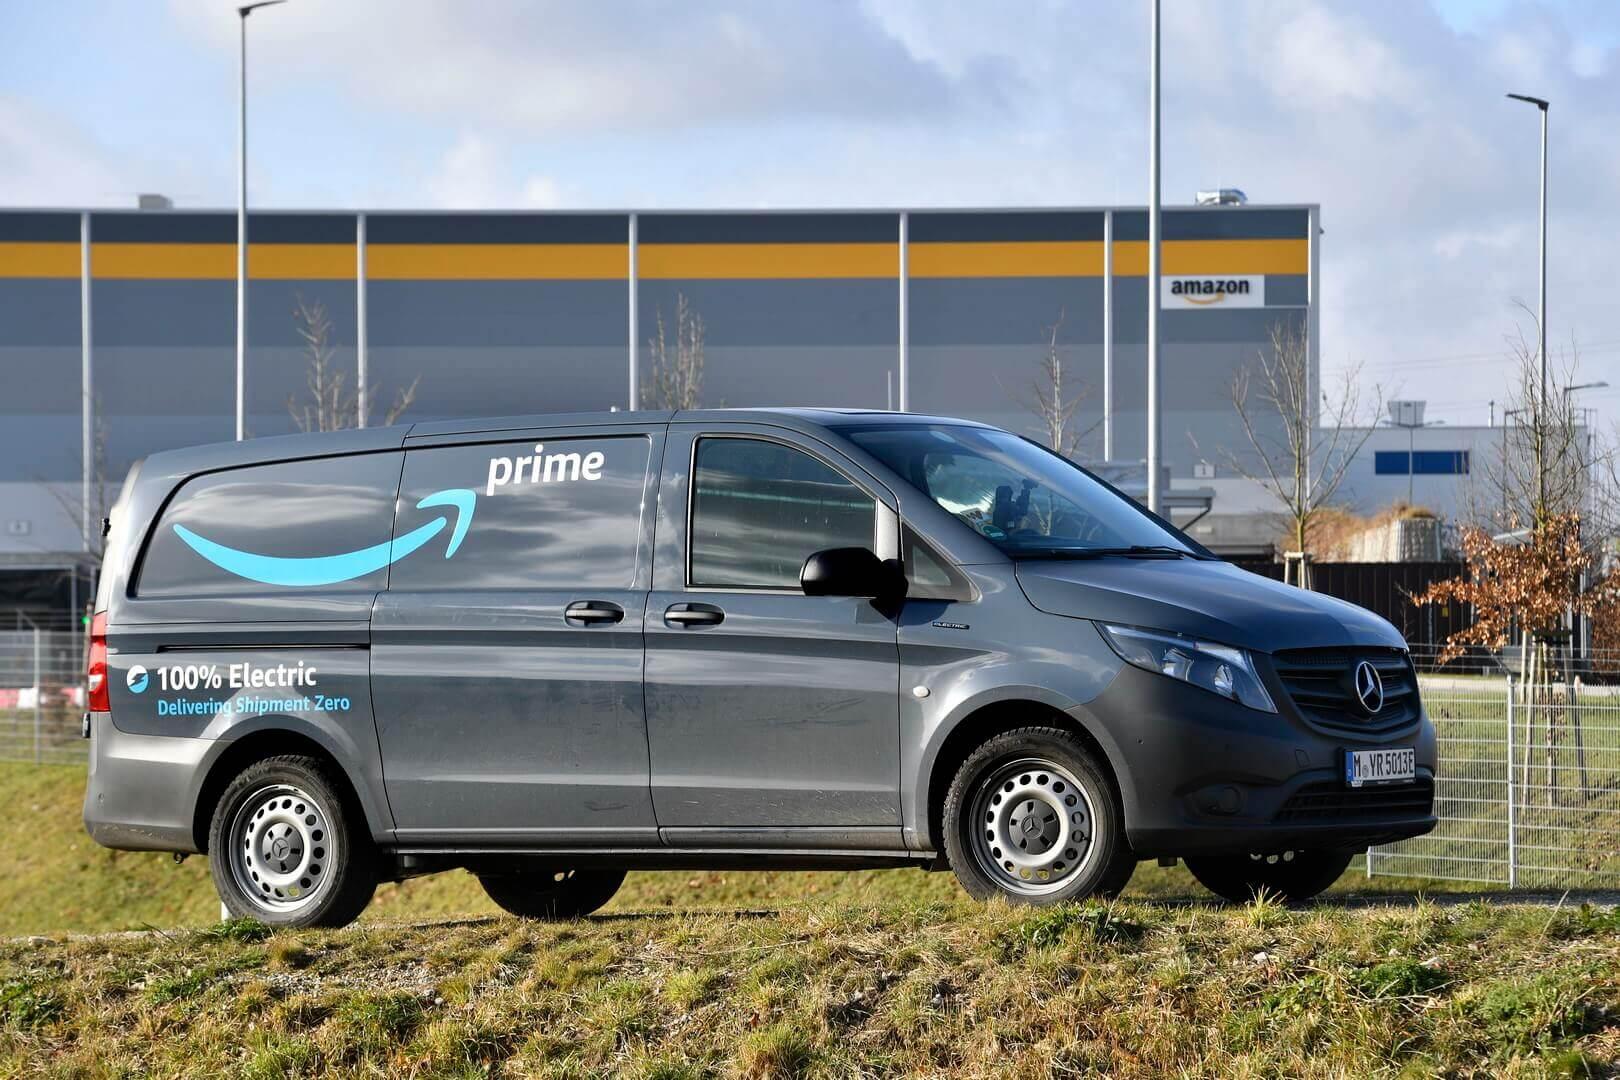 10 Mercedes-Benz eVito пополнили автопарк Amazon в Мюнхене